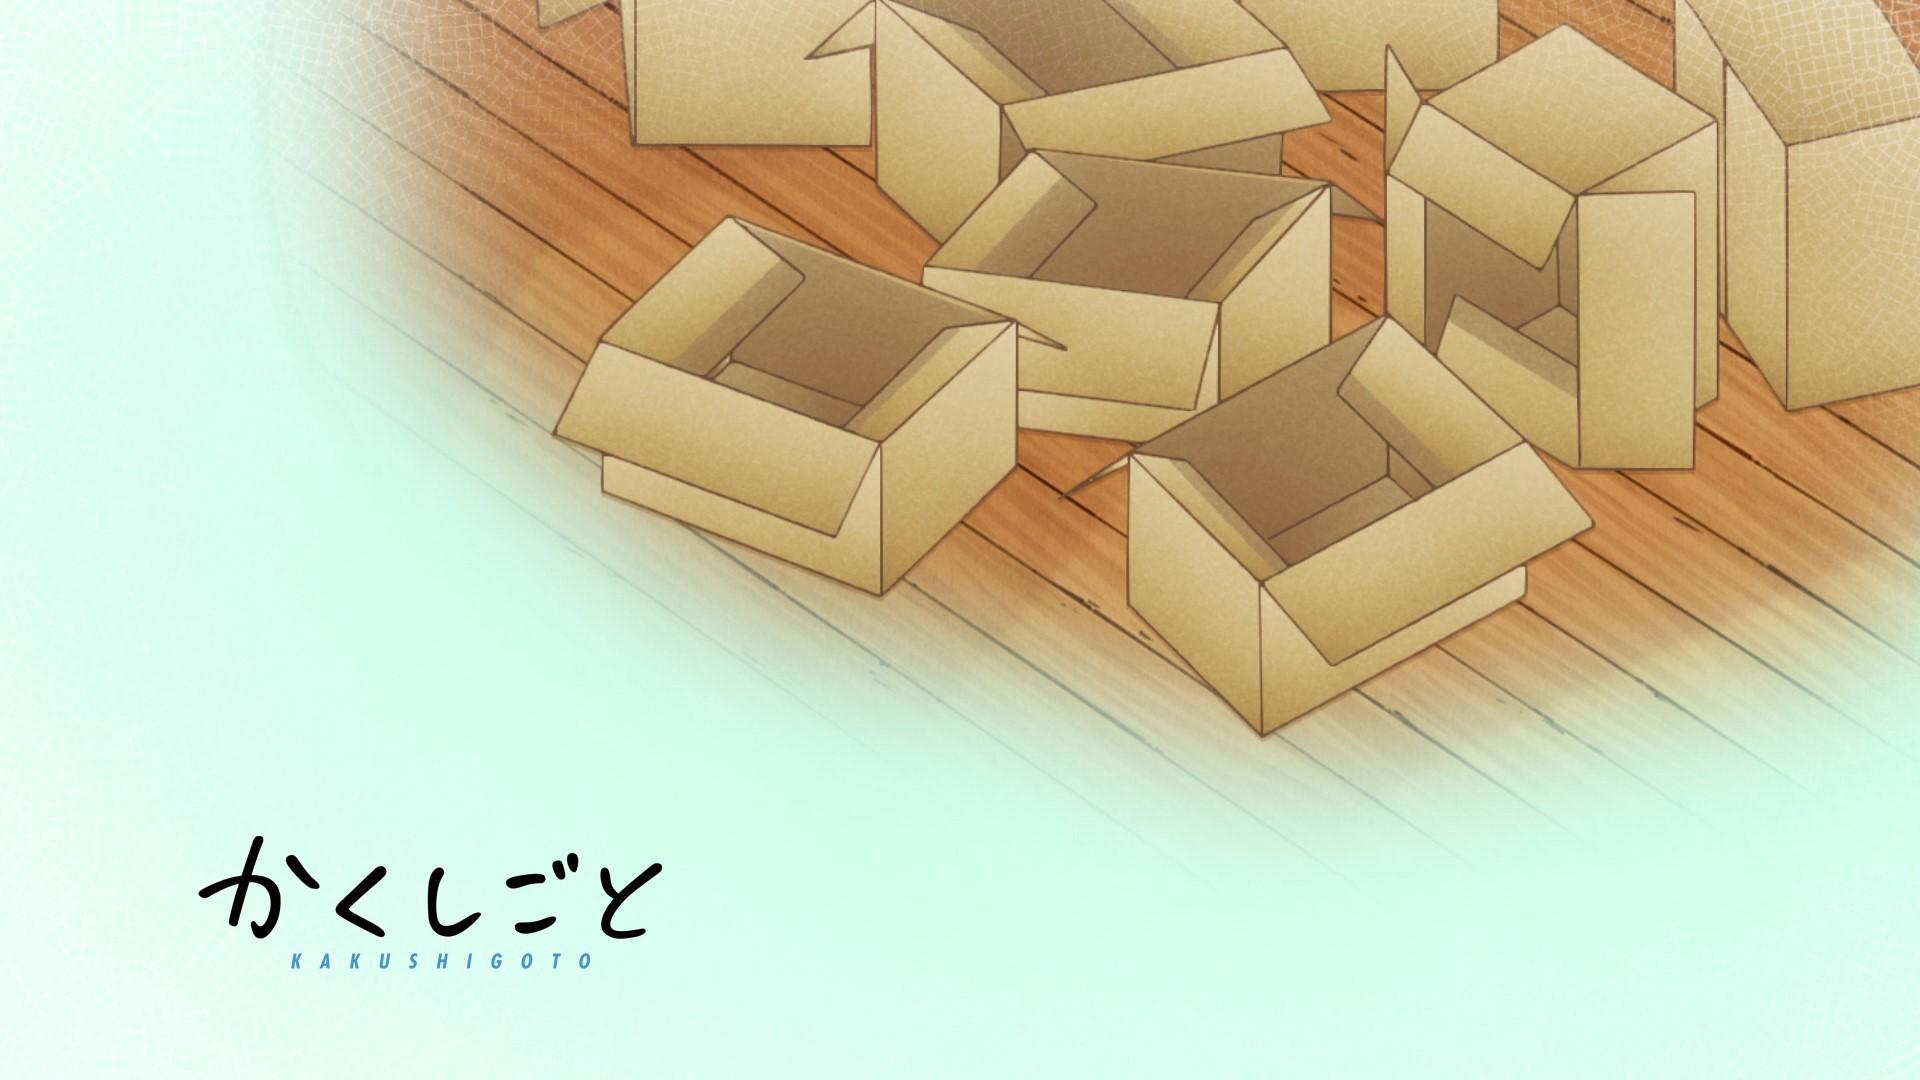 Kakushigoto Episode 05 Eyecatch 1